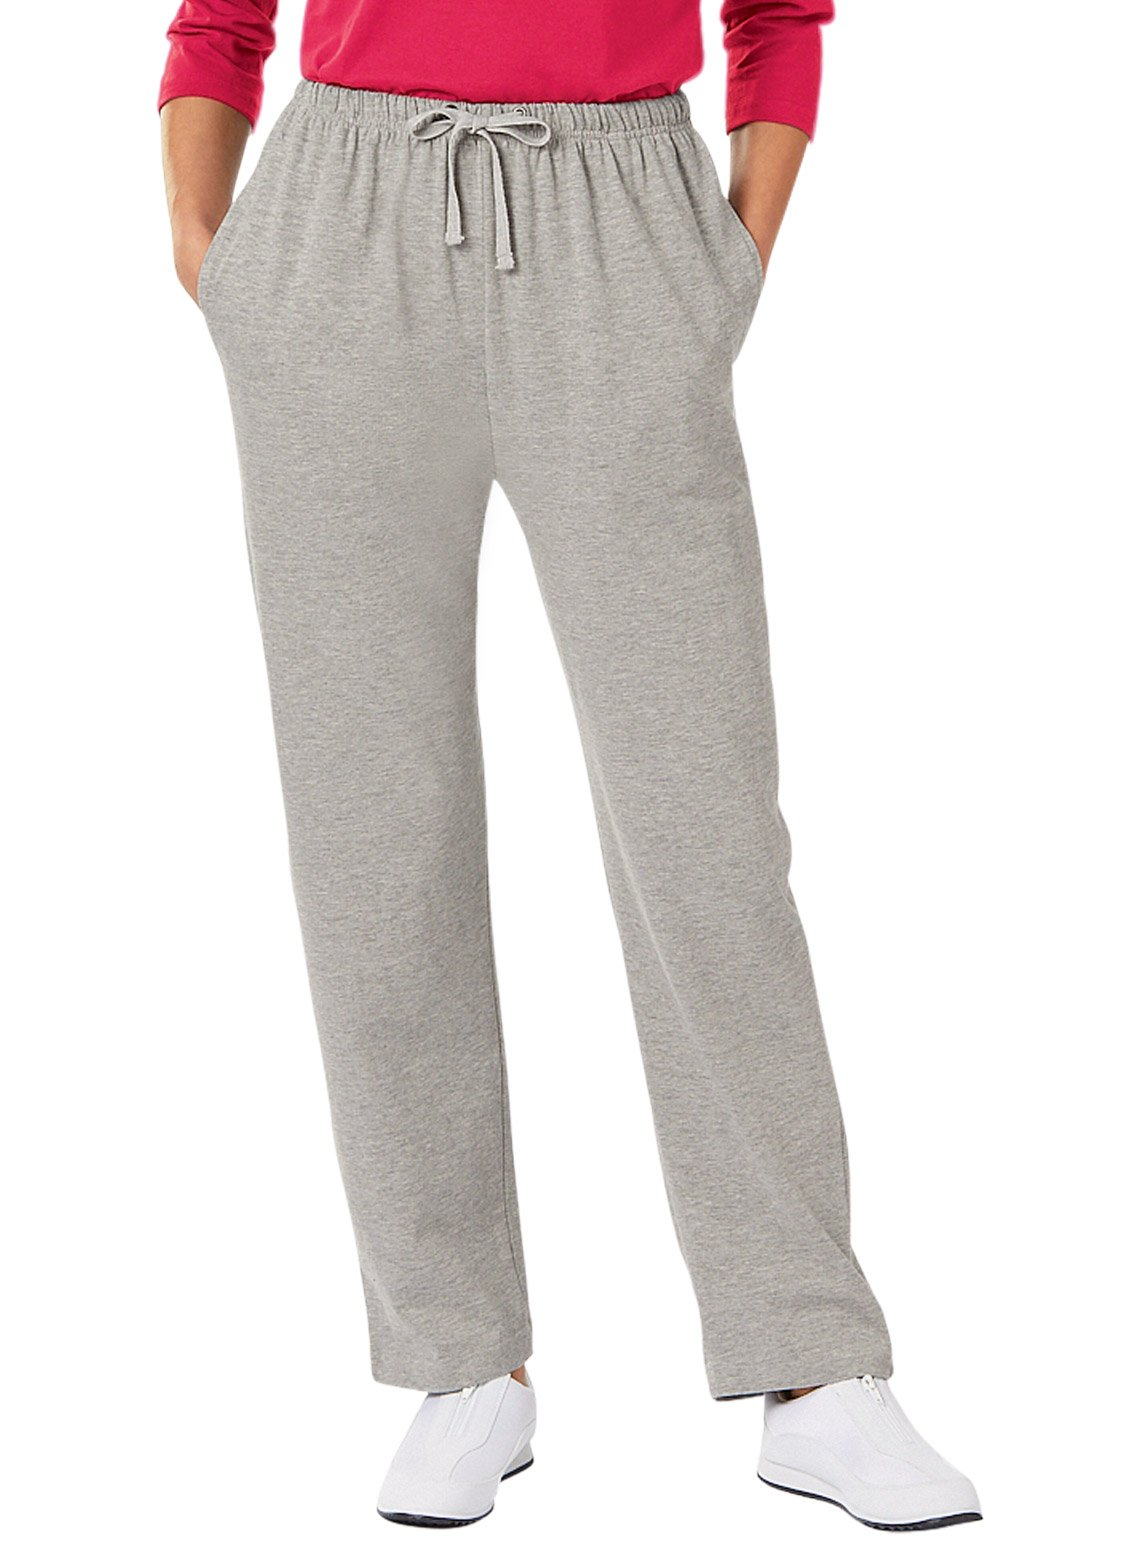 Carol Wright Gifts Jersey Knit Pants, Gray, Size Medium